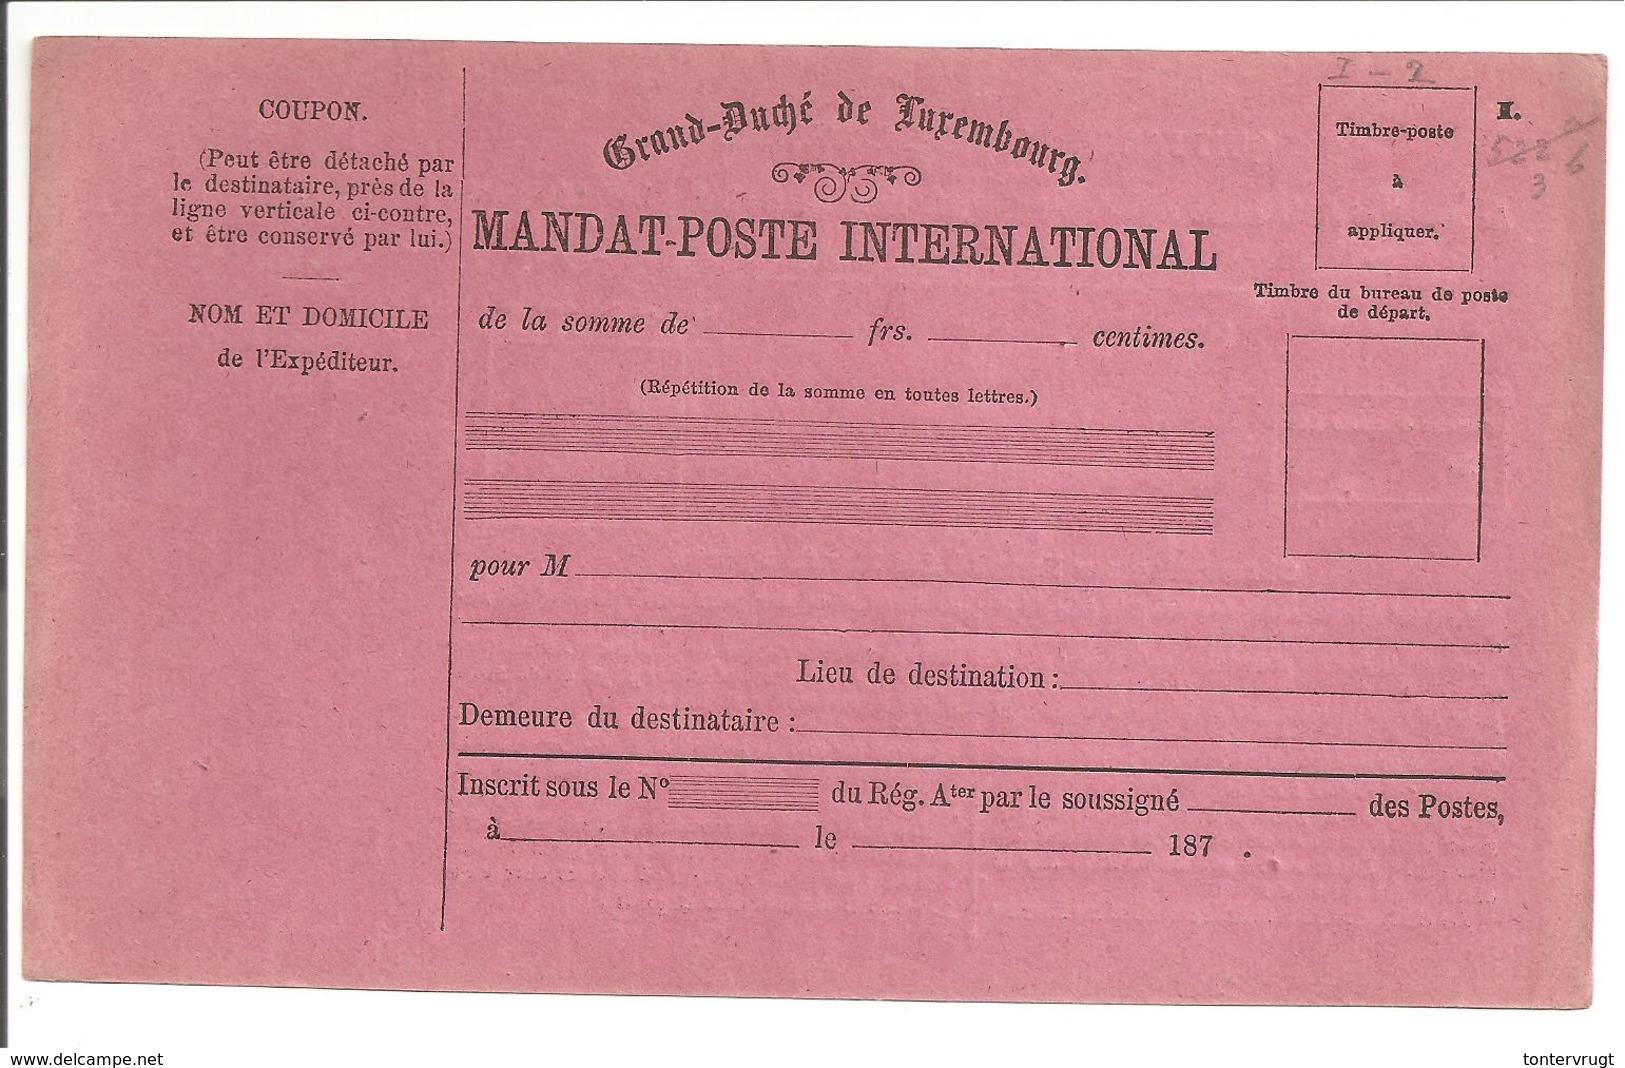 MANDAT-POSTE INTERNATIONAL 1. - Ganzsachen